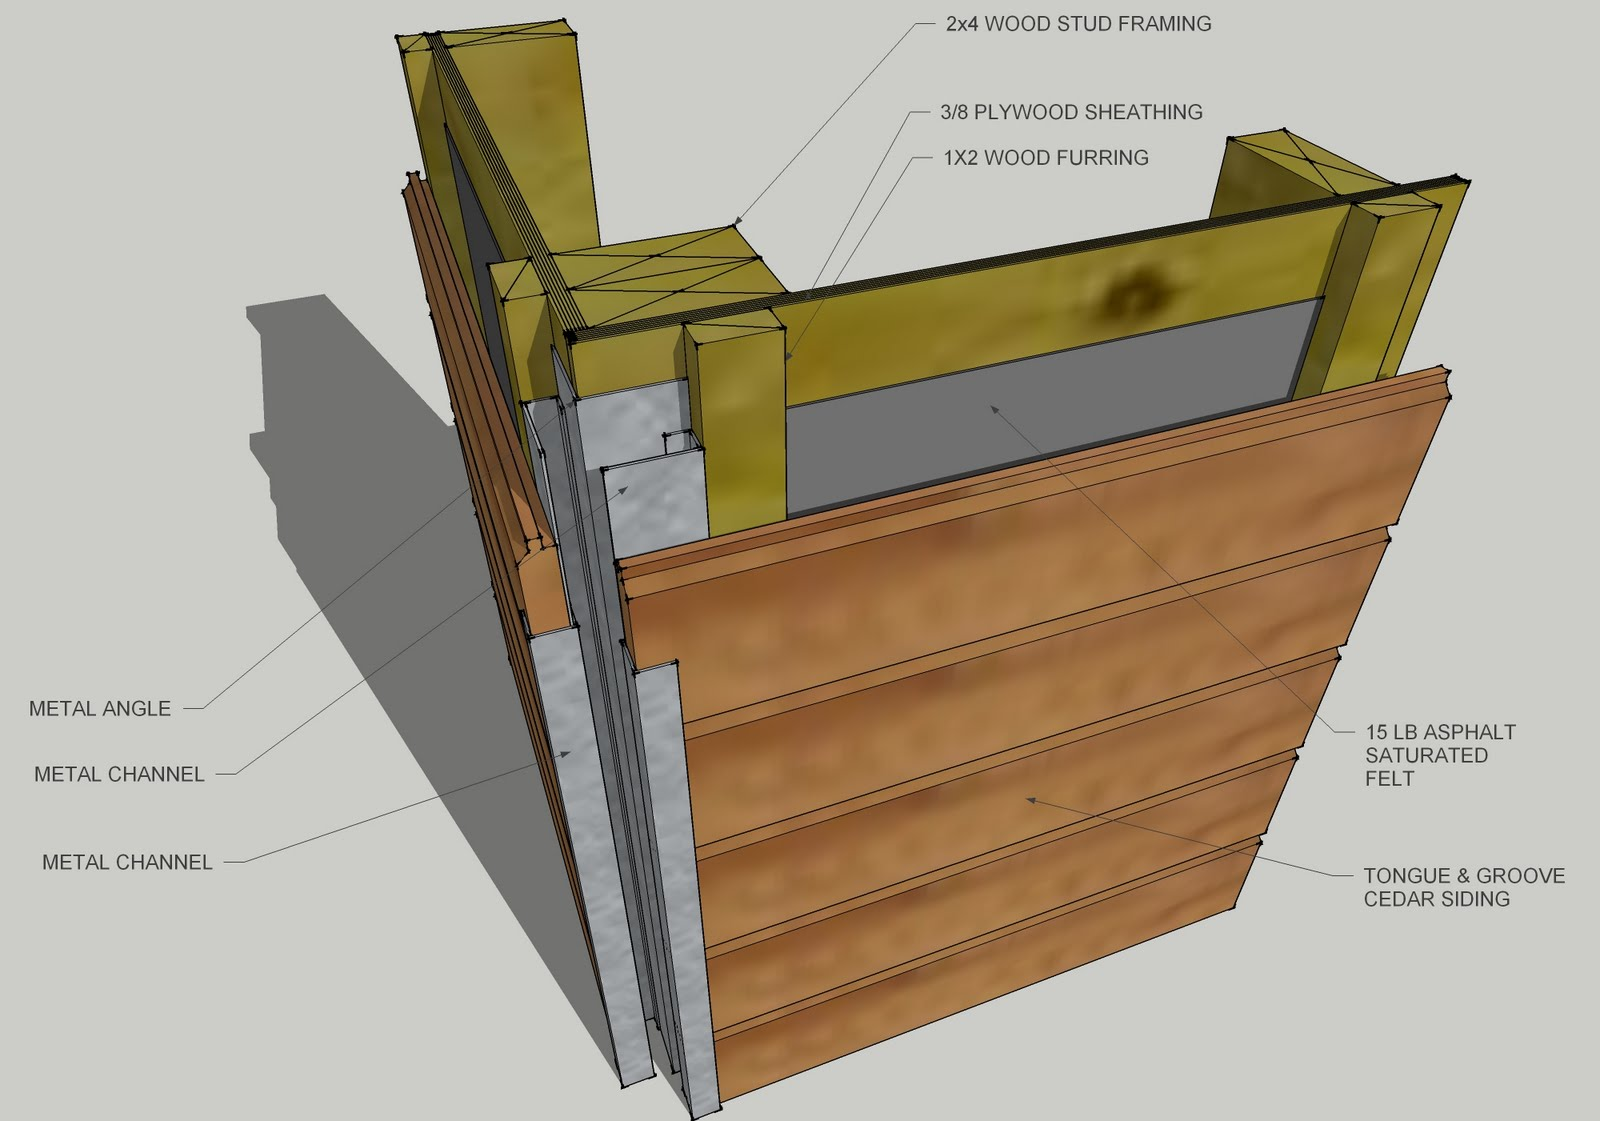 Corner 112009 Jpg Jpeg Image 1600 1121 Pixels Scaled 81 Cedar Siding Siding Wood Studs